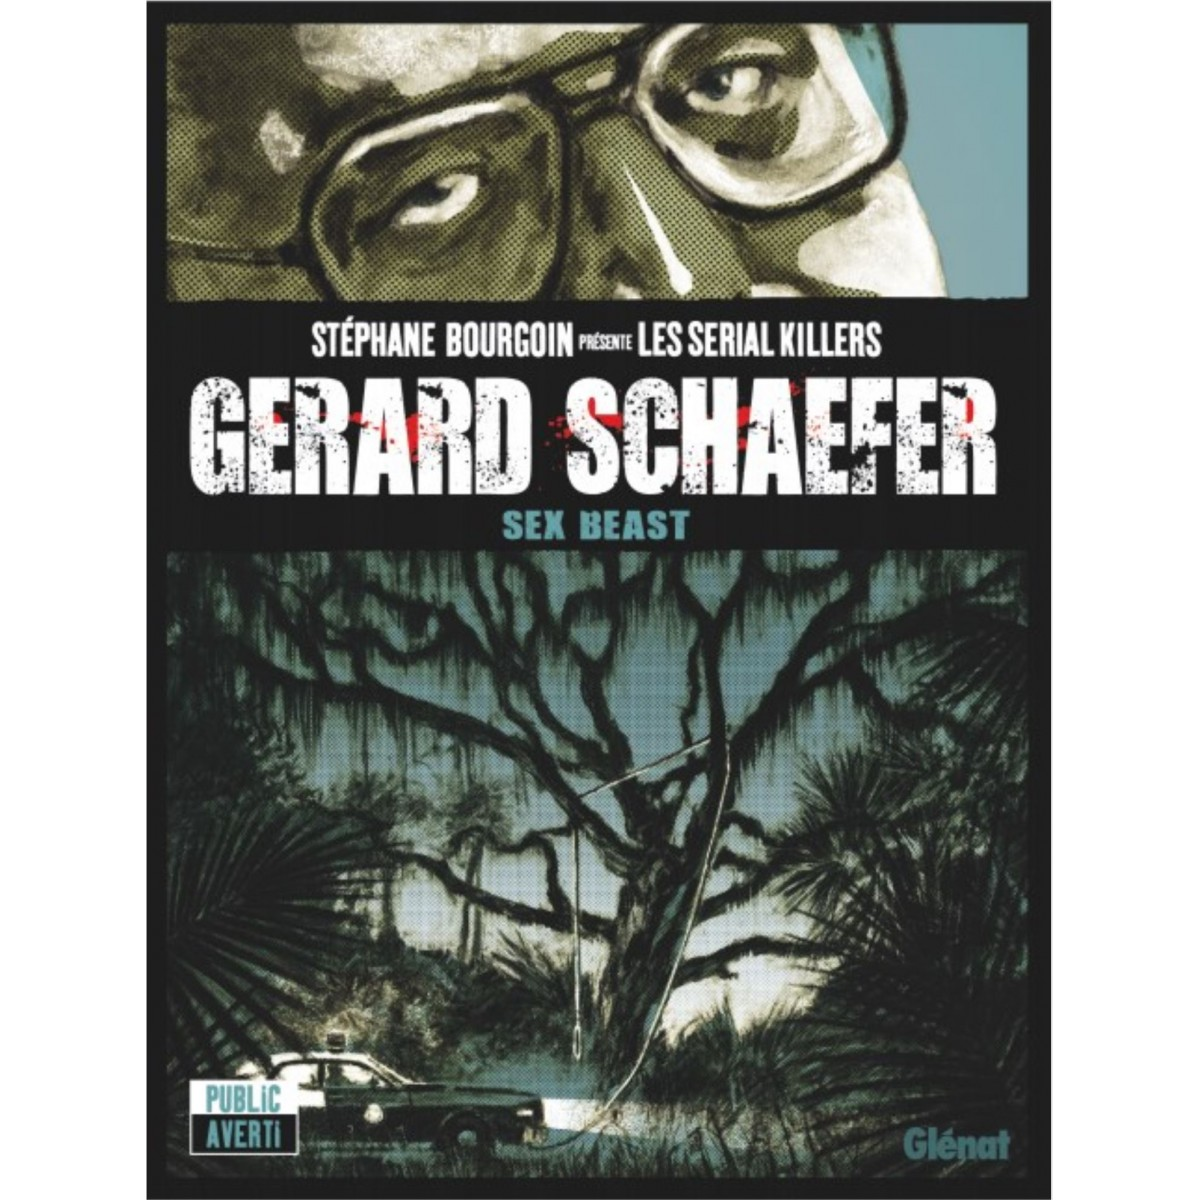 Jean-David Morvan - Gerard Schaefer, Sex Beast